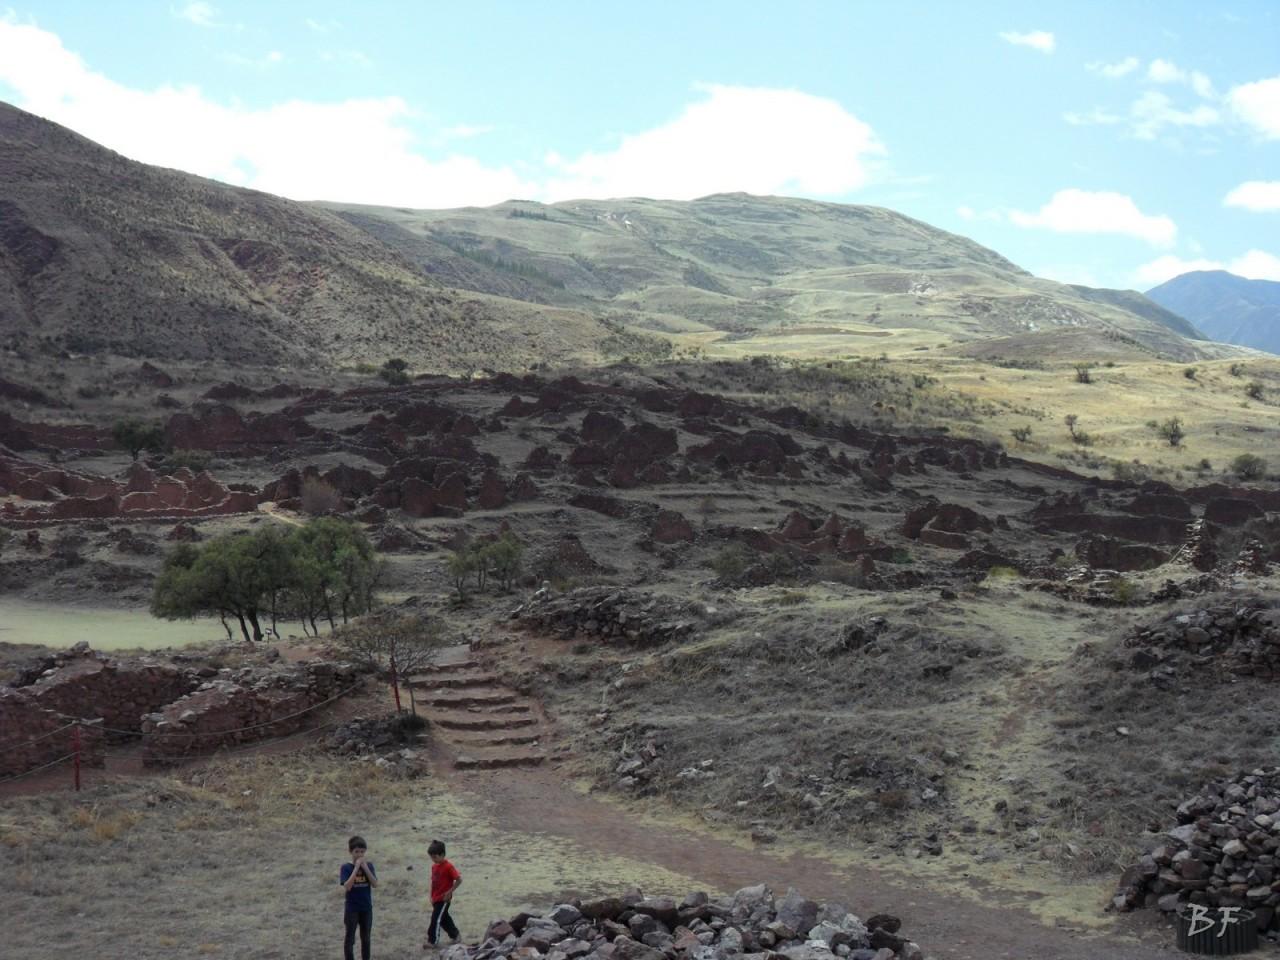 Parco-Archeologico-Megaliti-Pikillacta-Andahuaylillas-Cusco-Perù-10